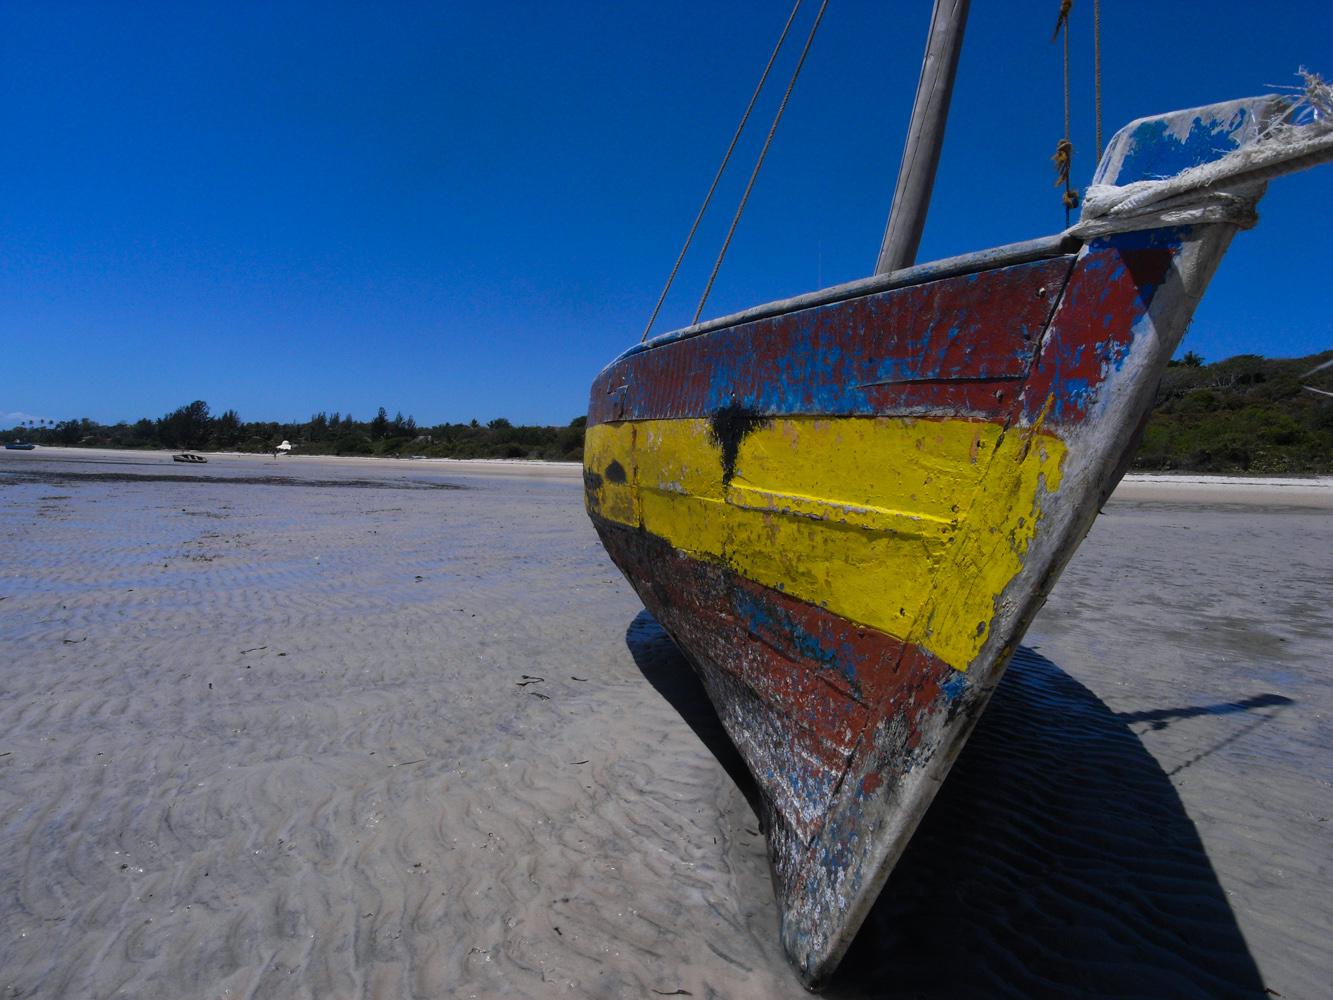 Mosambik_Vilankulos_Maputo_Tofo_Tofo_Peri_Peri_Divers, Walhai, Bazaruto